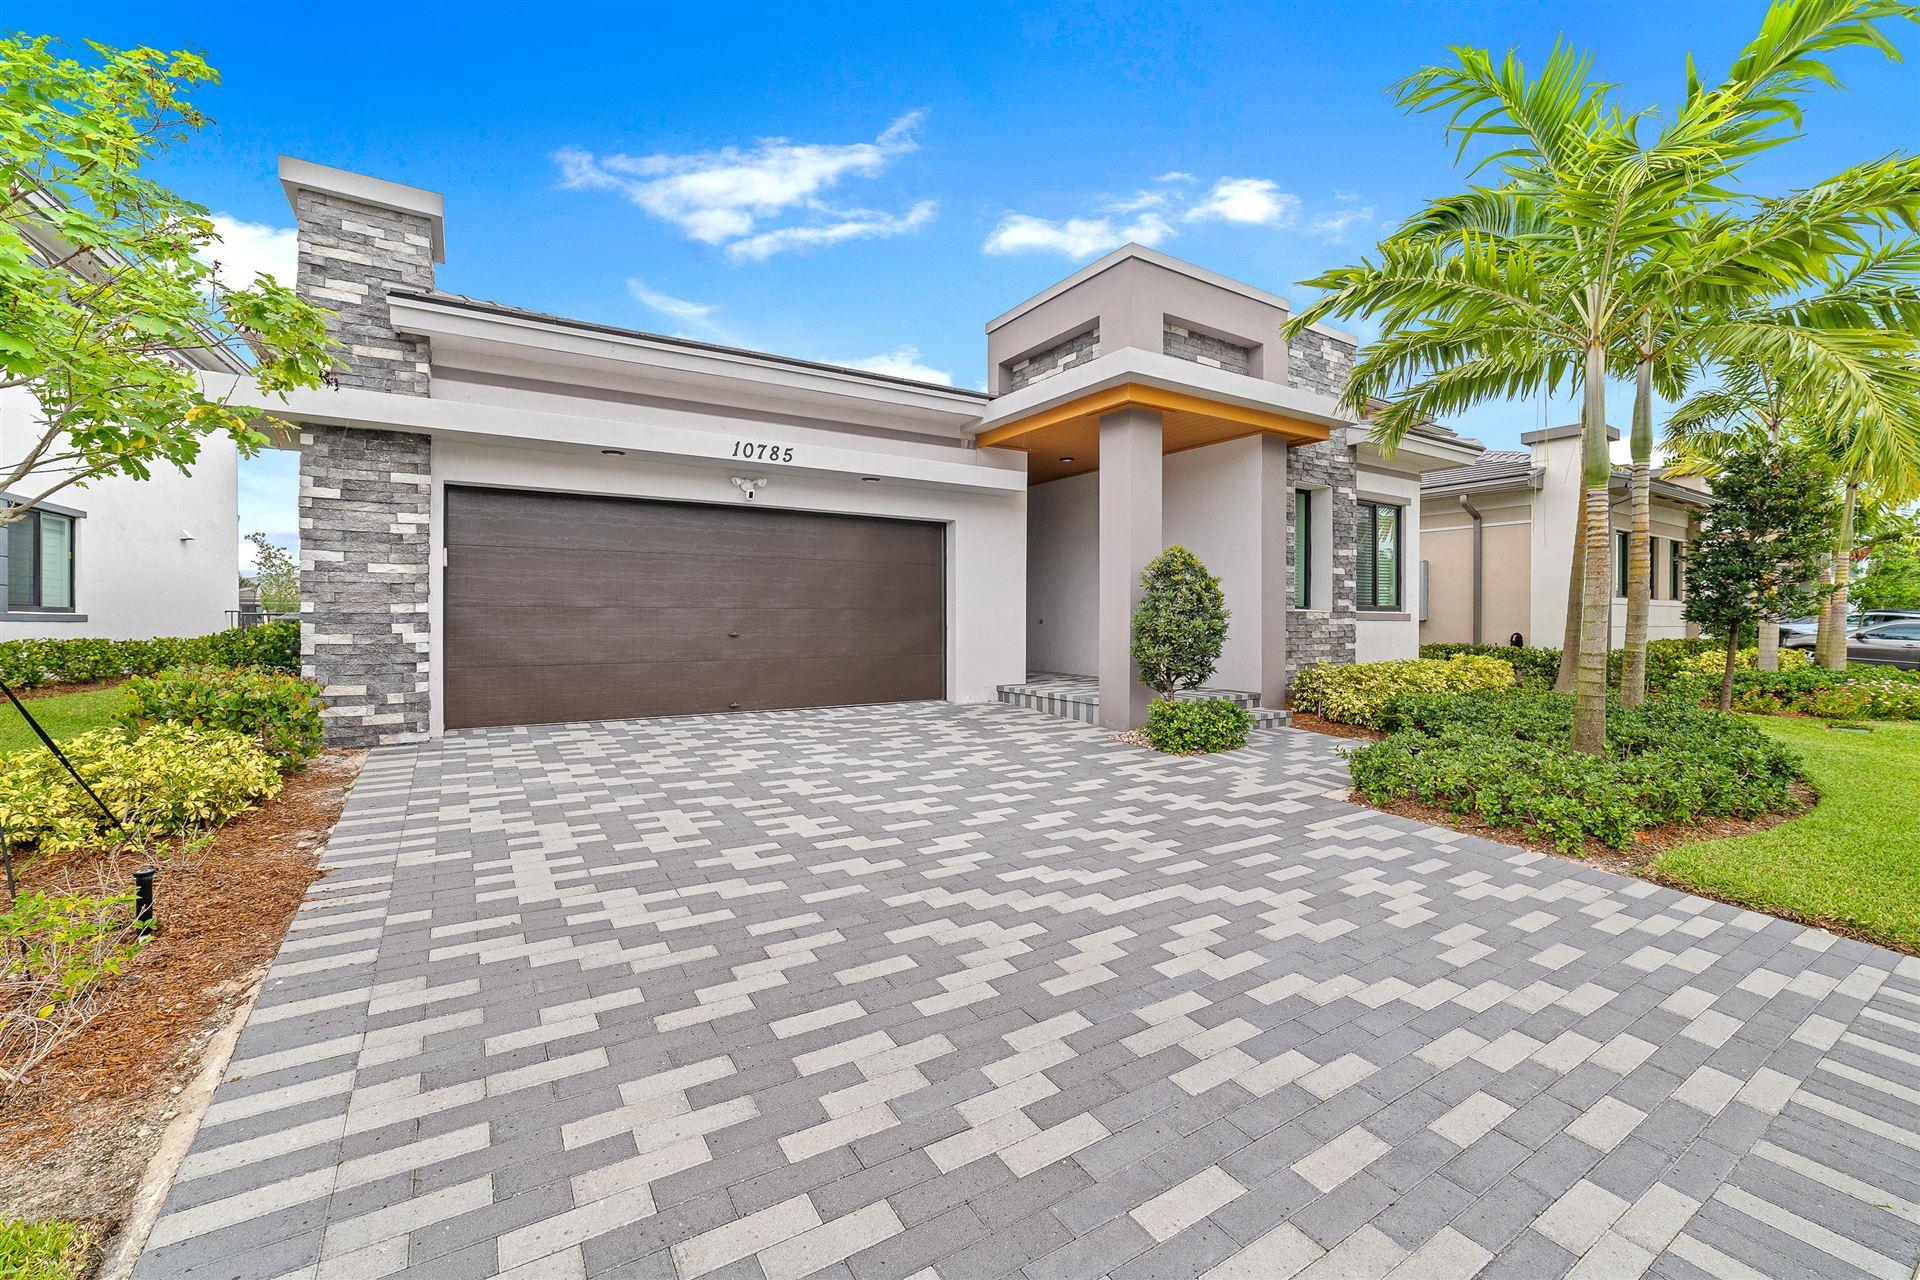 Photo of 10785 Pacifica Way, Parkland, FL 33076 (MLS # RX-10670989)